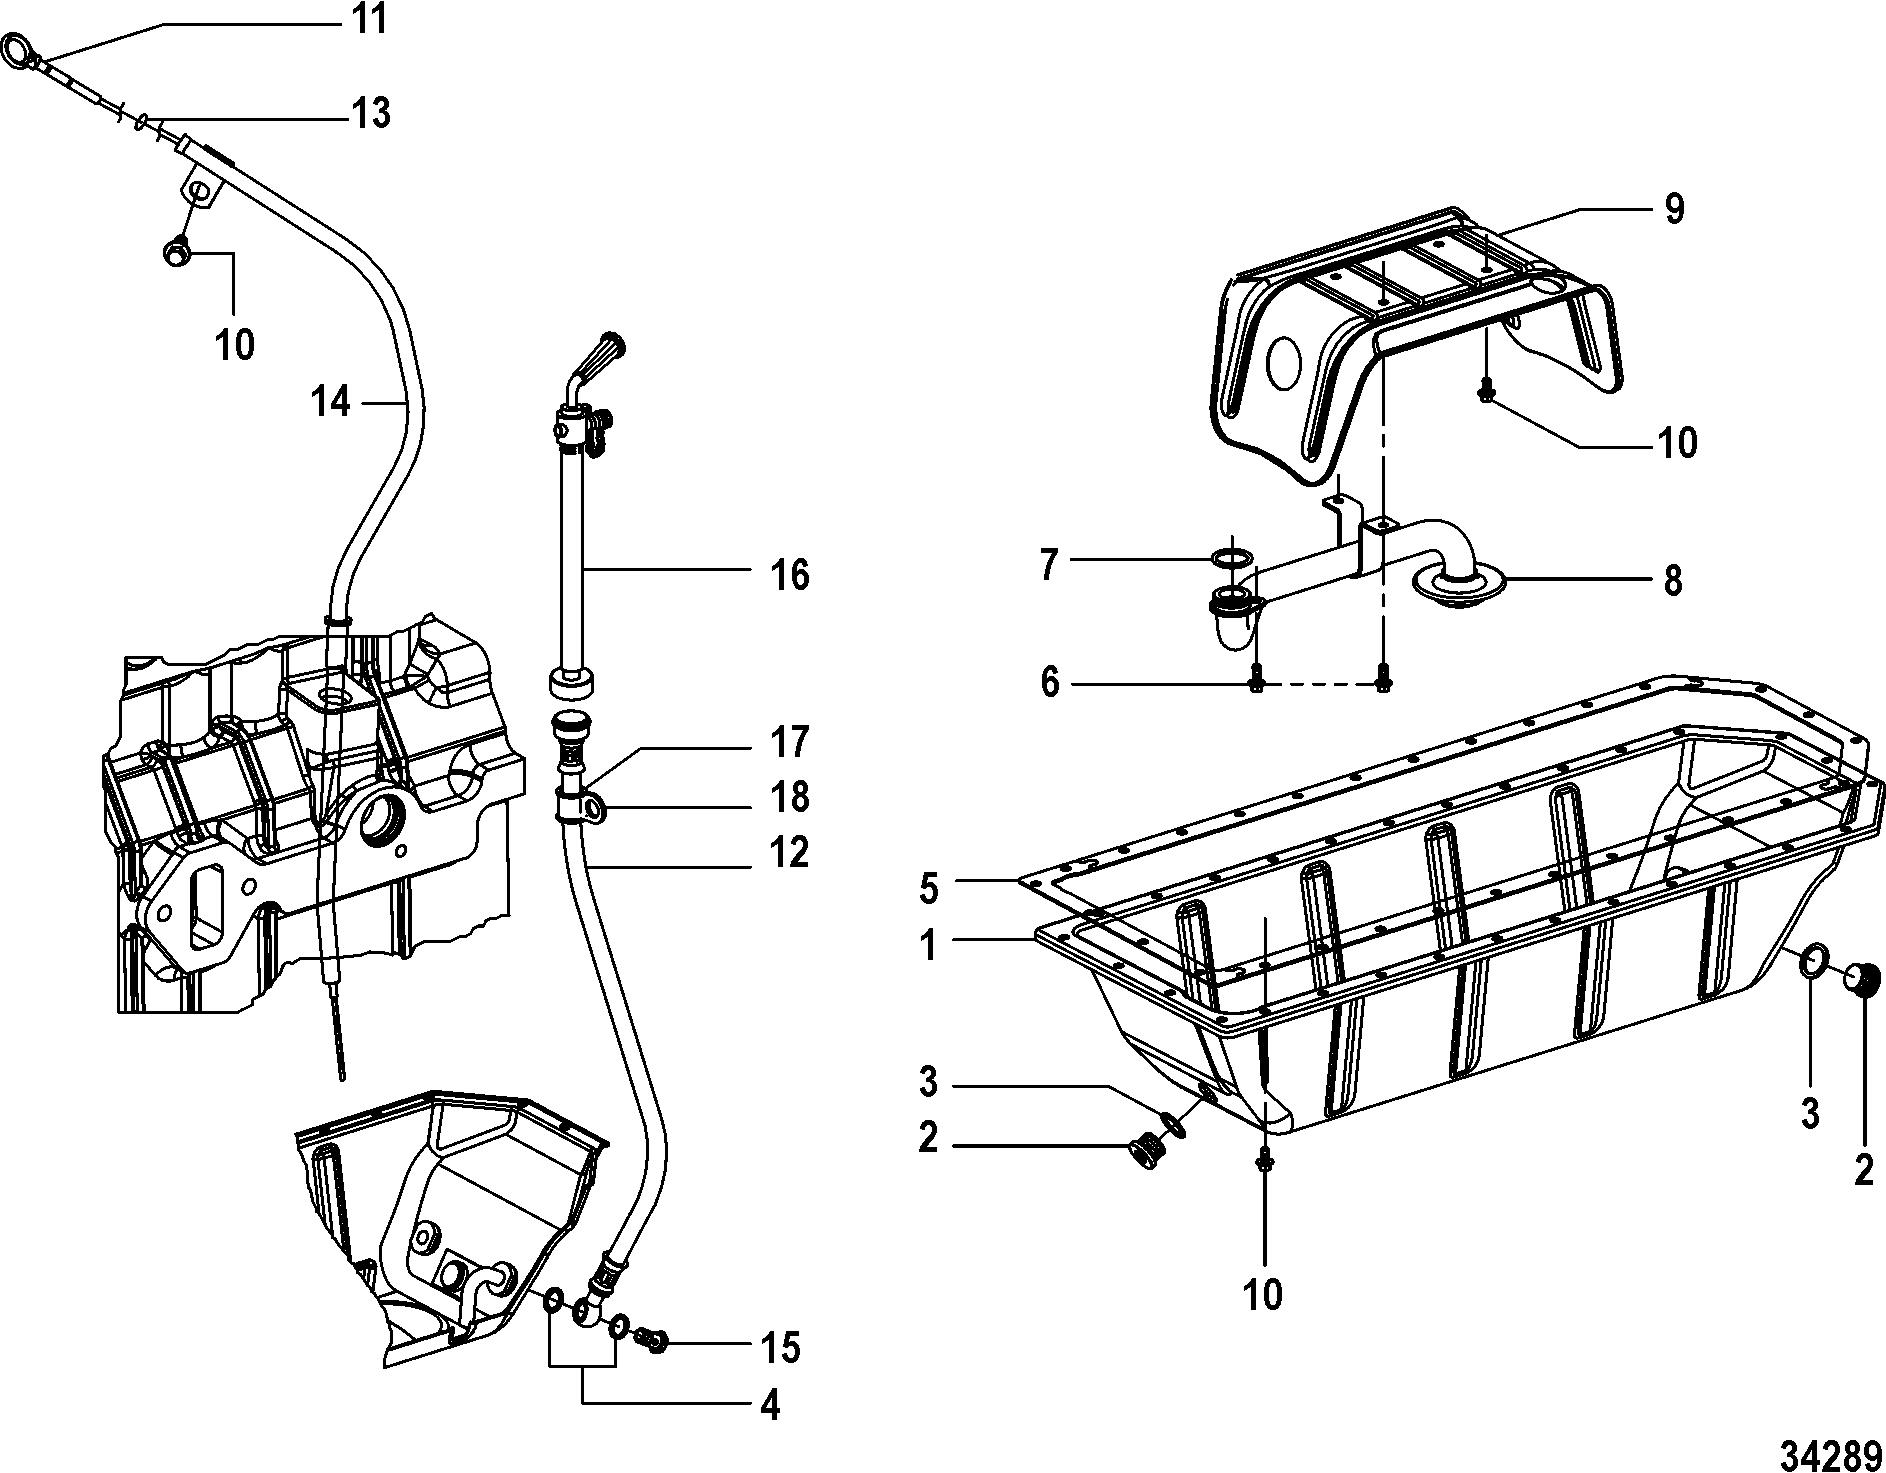 2001 dodge 2500 headlight wiring diagram ceiling fan light kit ram sel